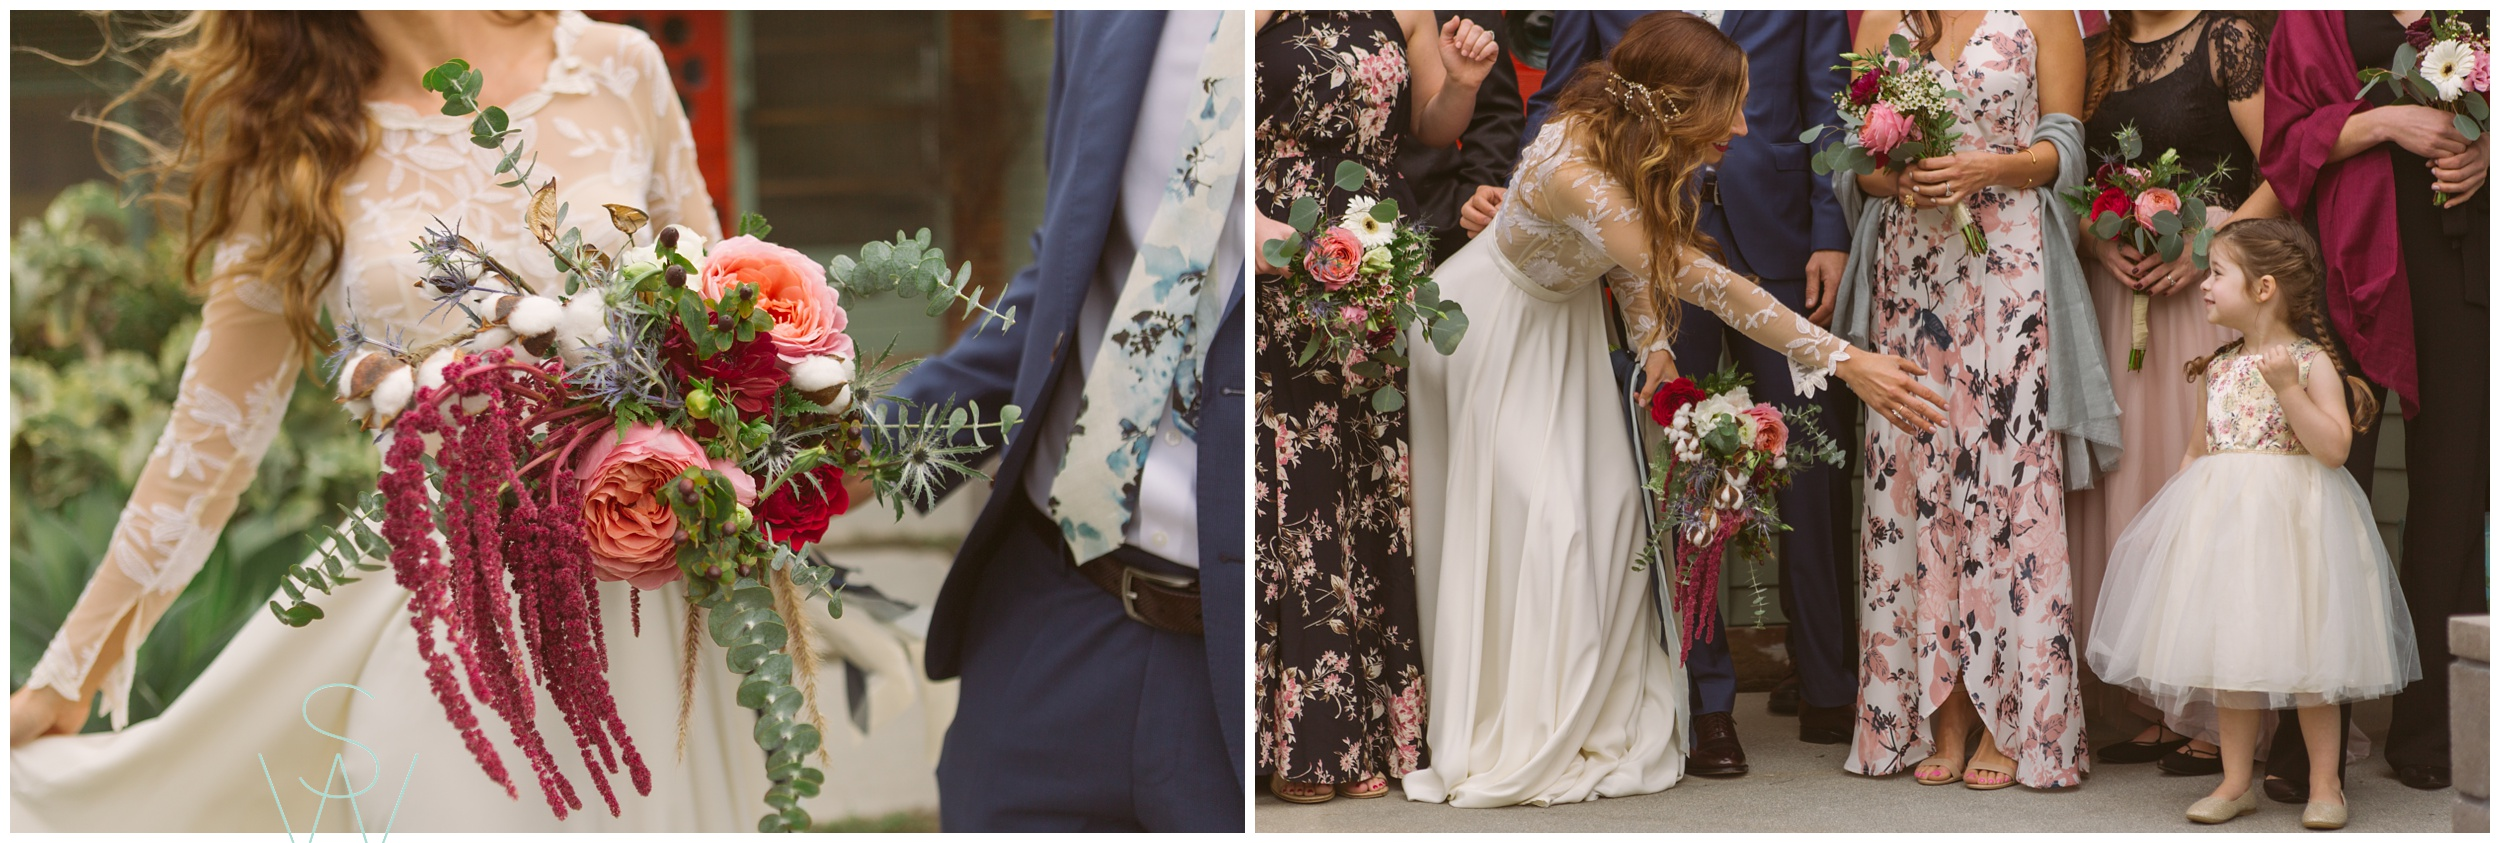 san.diego.wedding.photographer.luce.loft18.jpg